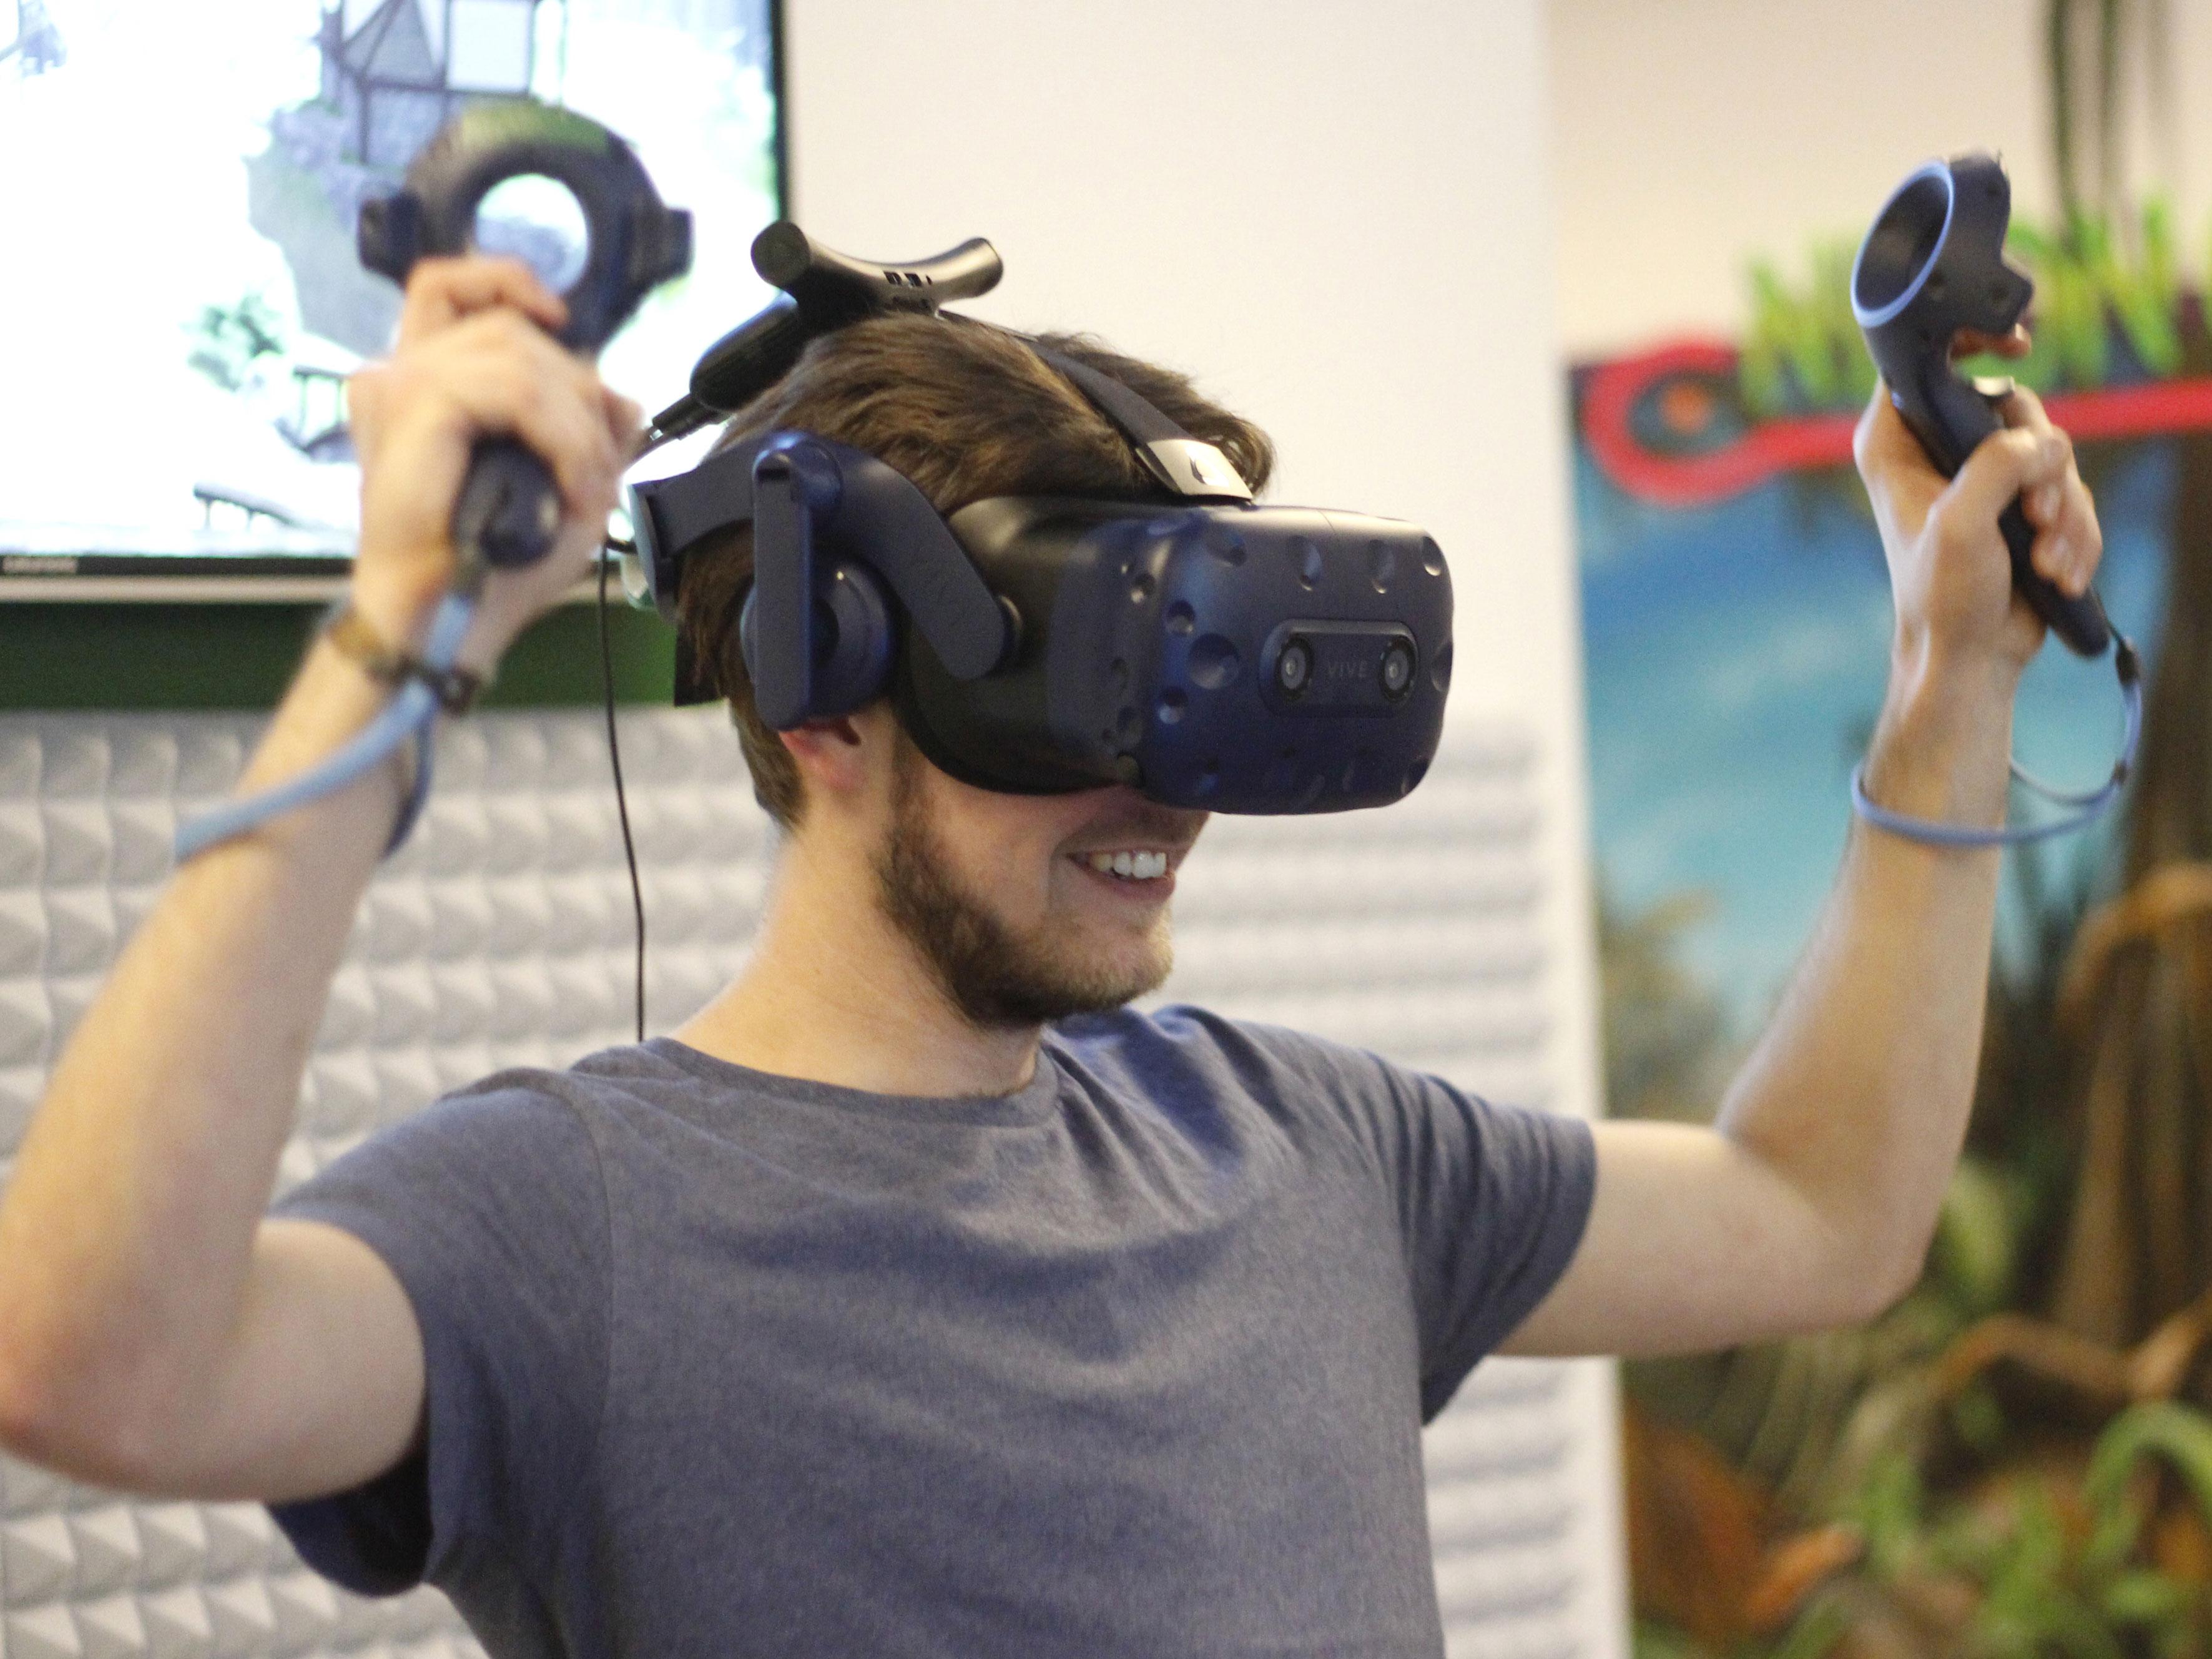 Foto: Galaxy VR